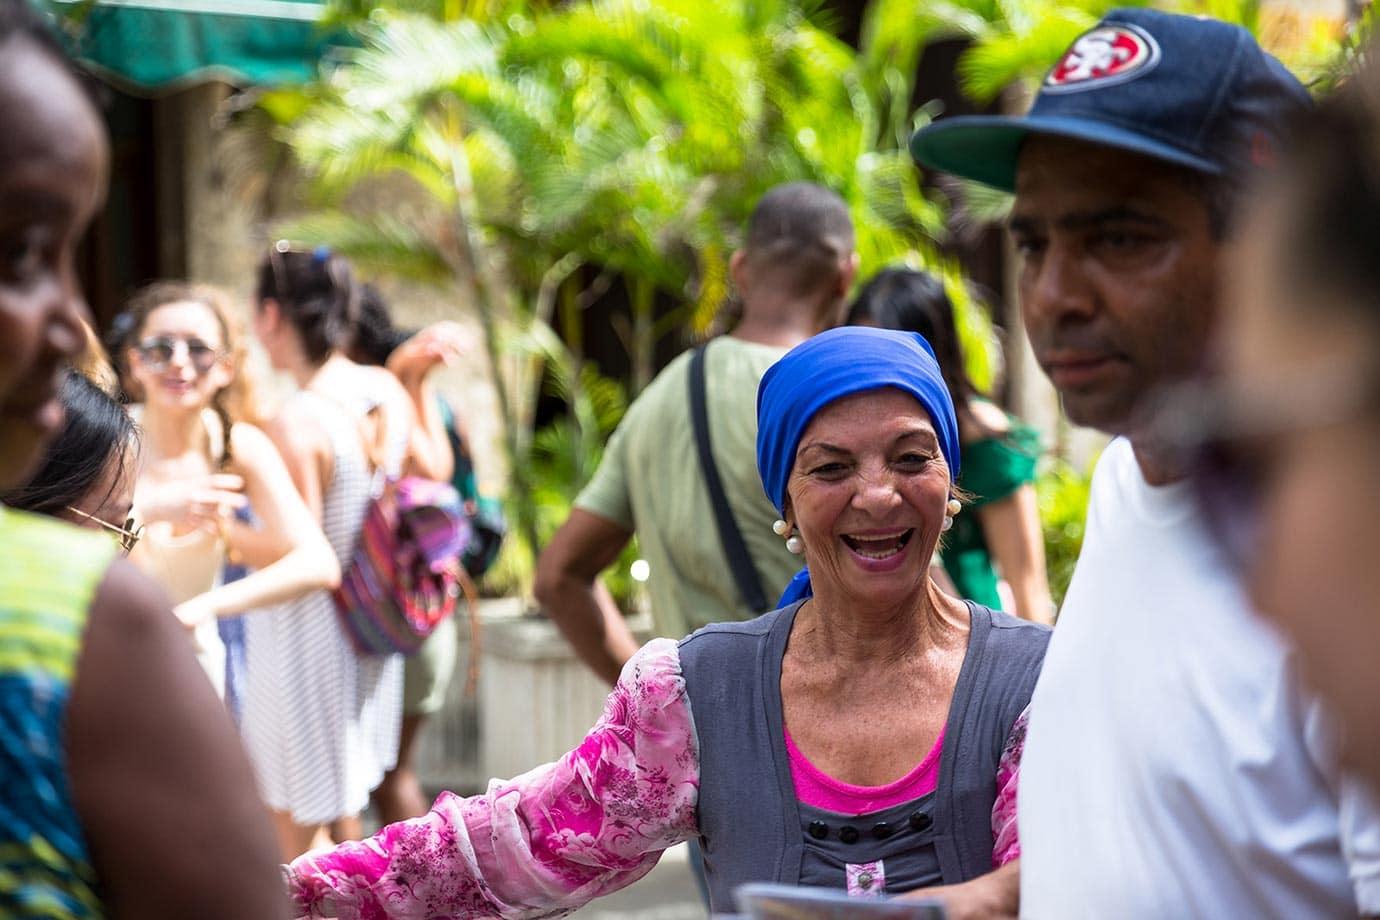 Cuban Beauty: Pictures of Cuban People in Havana (2021 Guide)